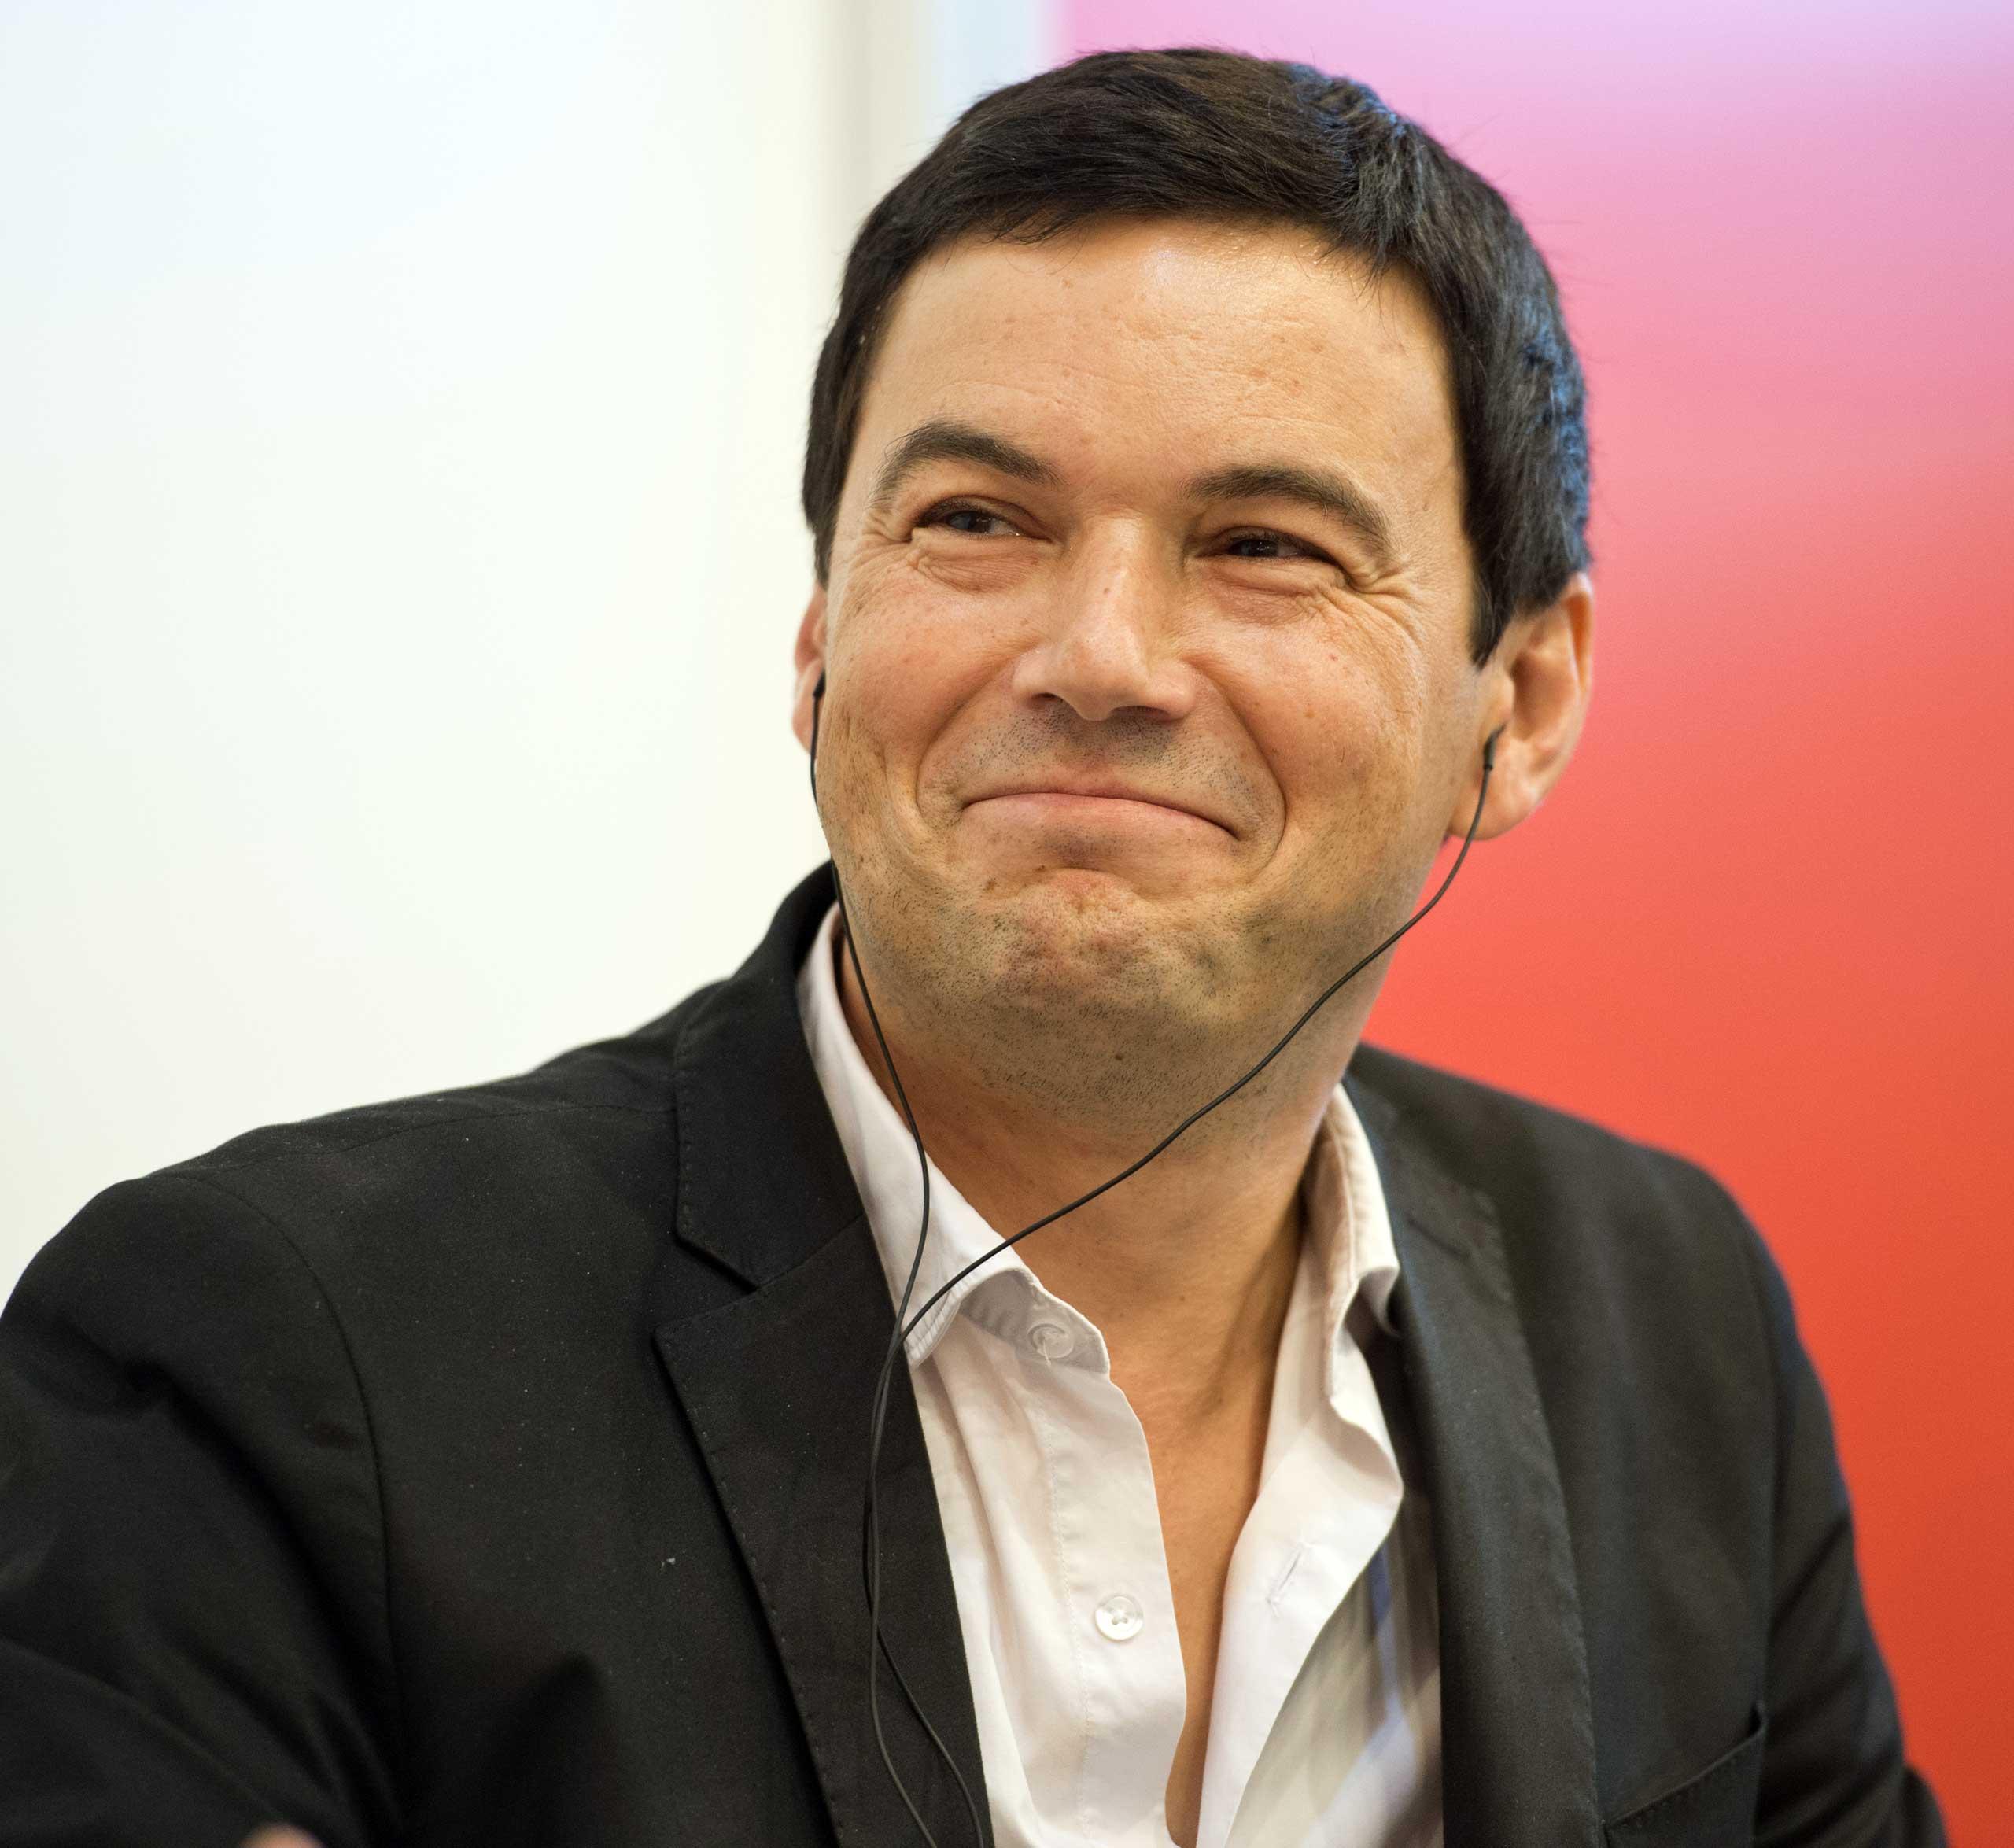 Economist Thomas Piketty in Frankfurt, Germany, in Oct. 2014.